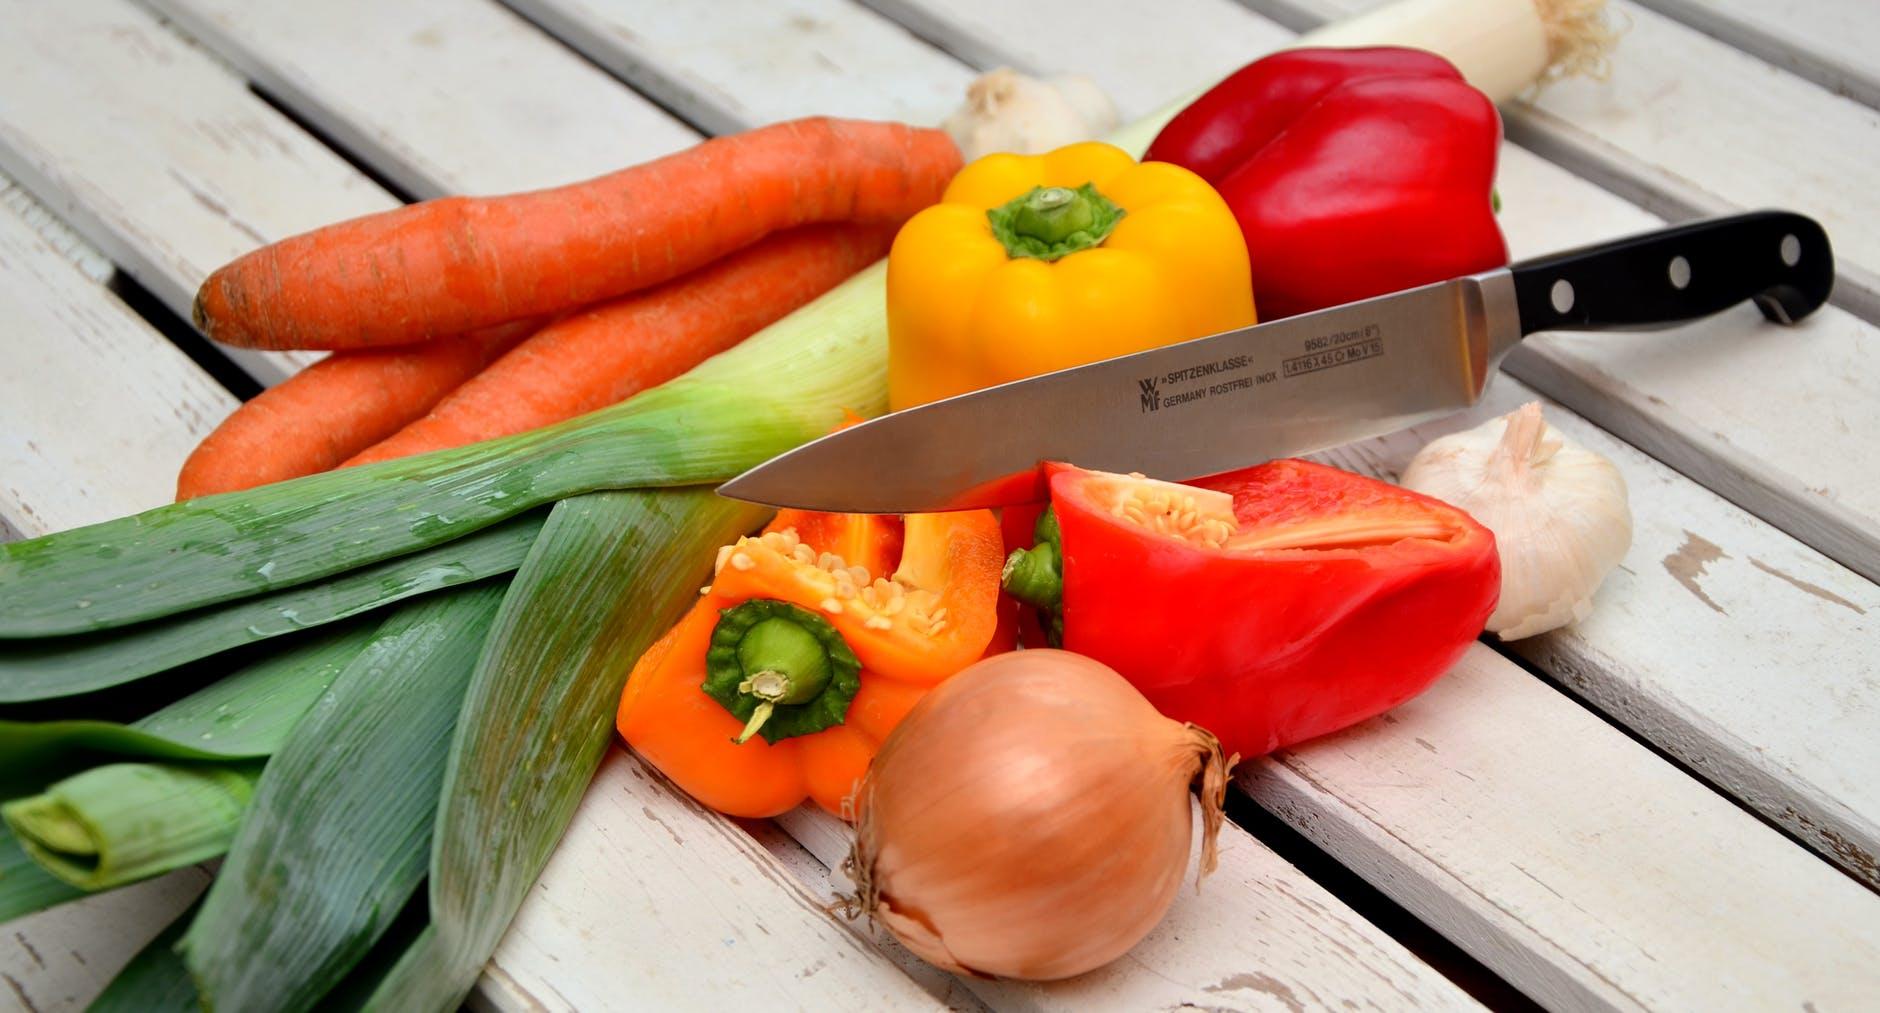 vegetables-knife-paprika-bell-peppers